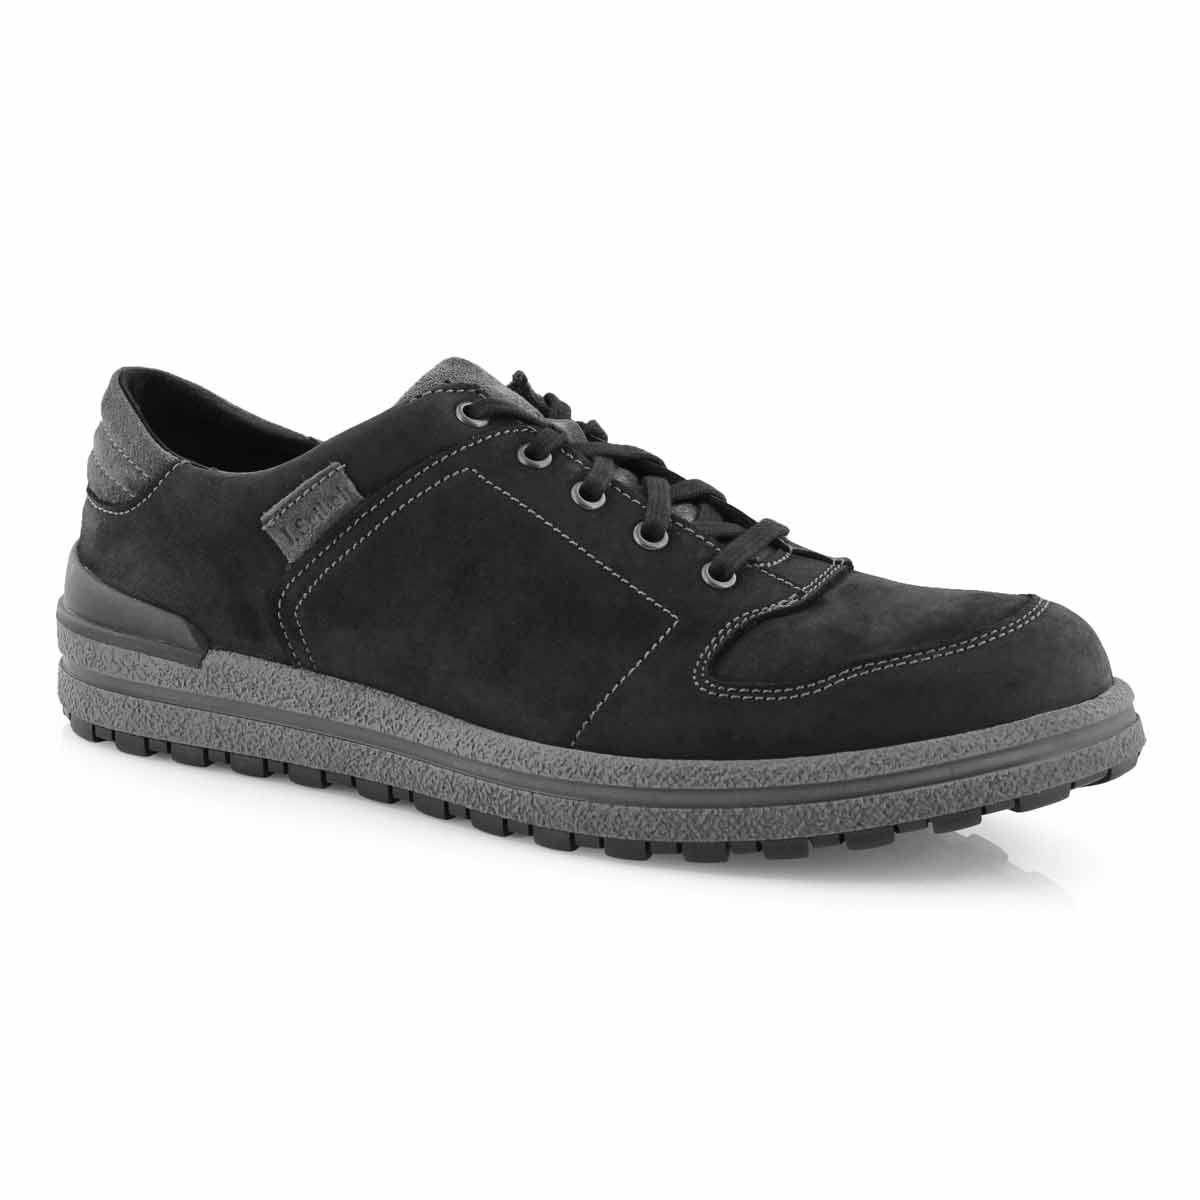 Mns Emil 17 schwarz lace up sneaker